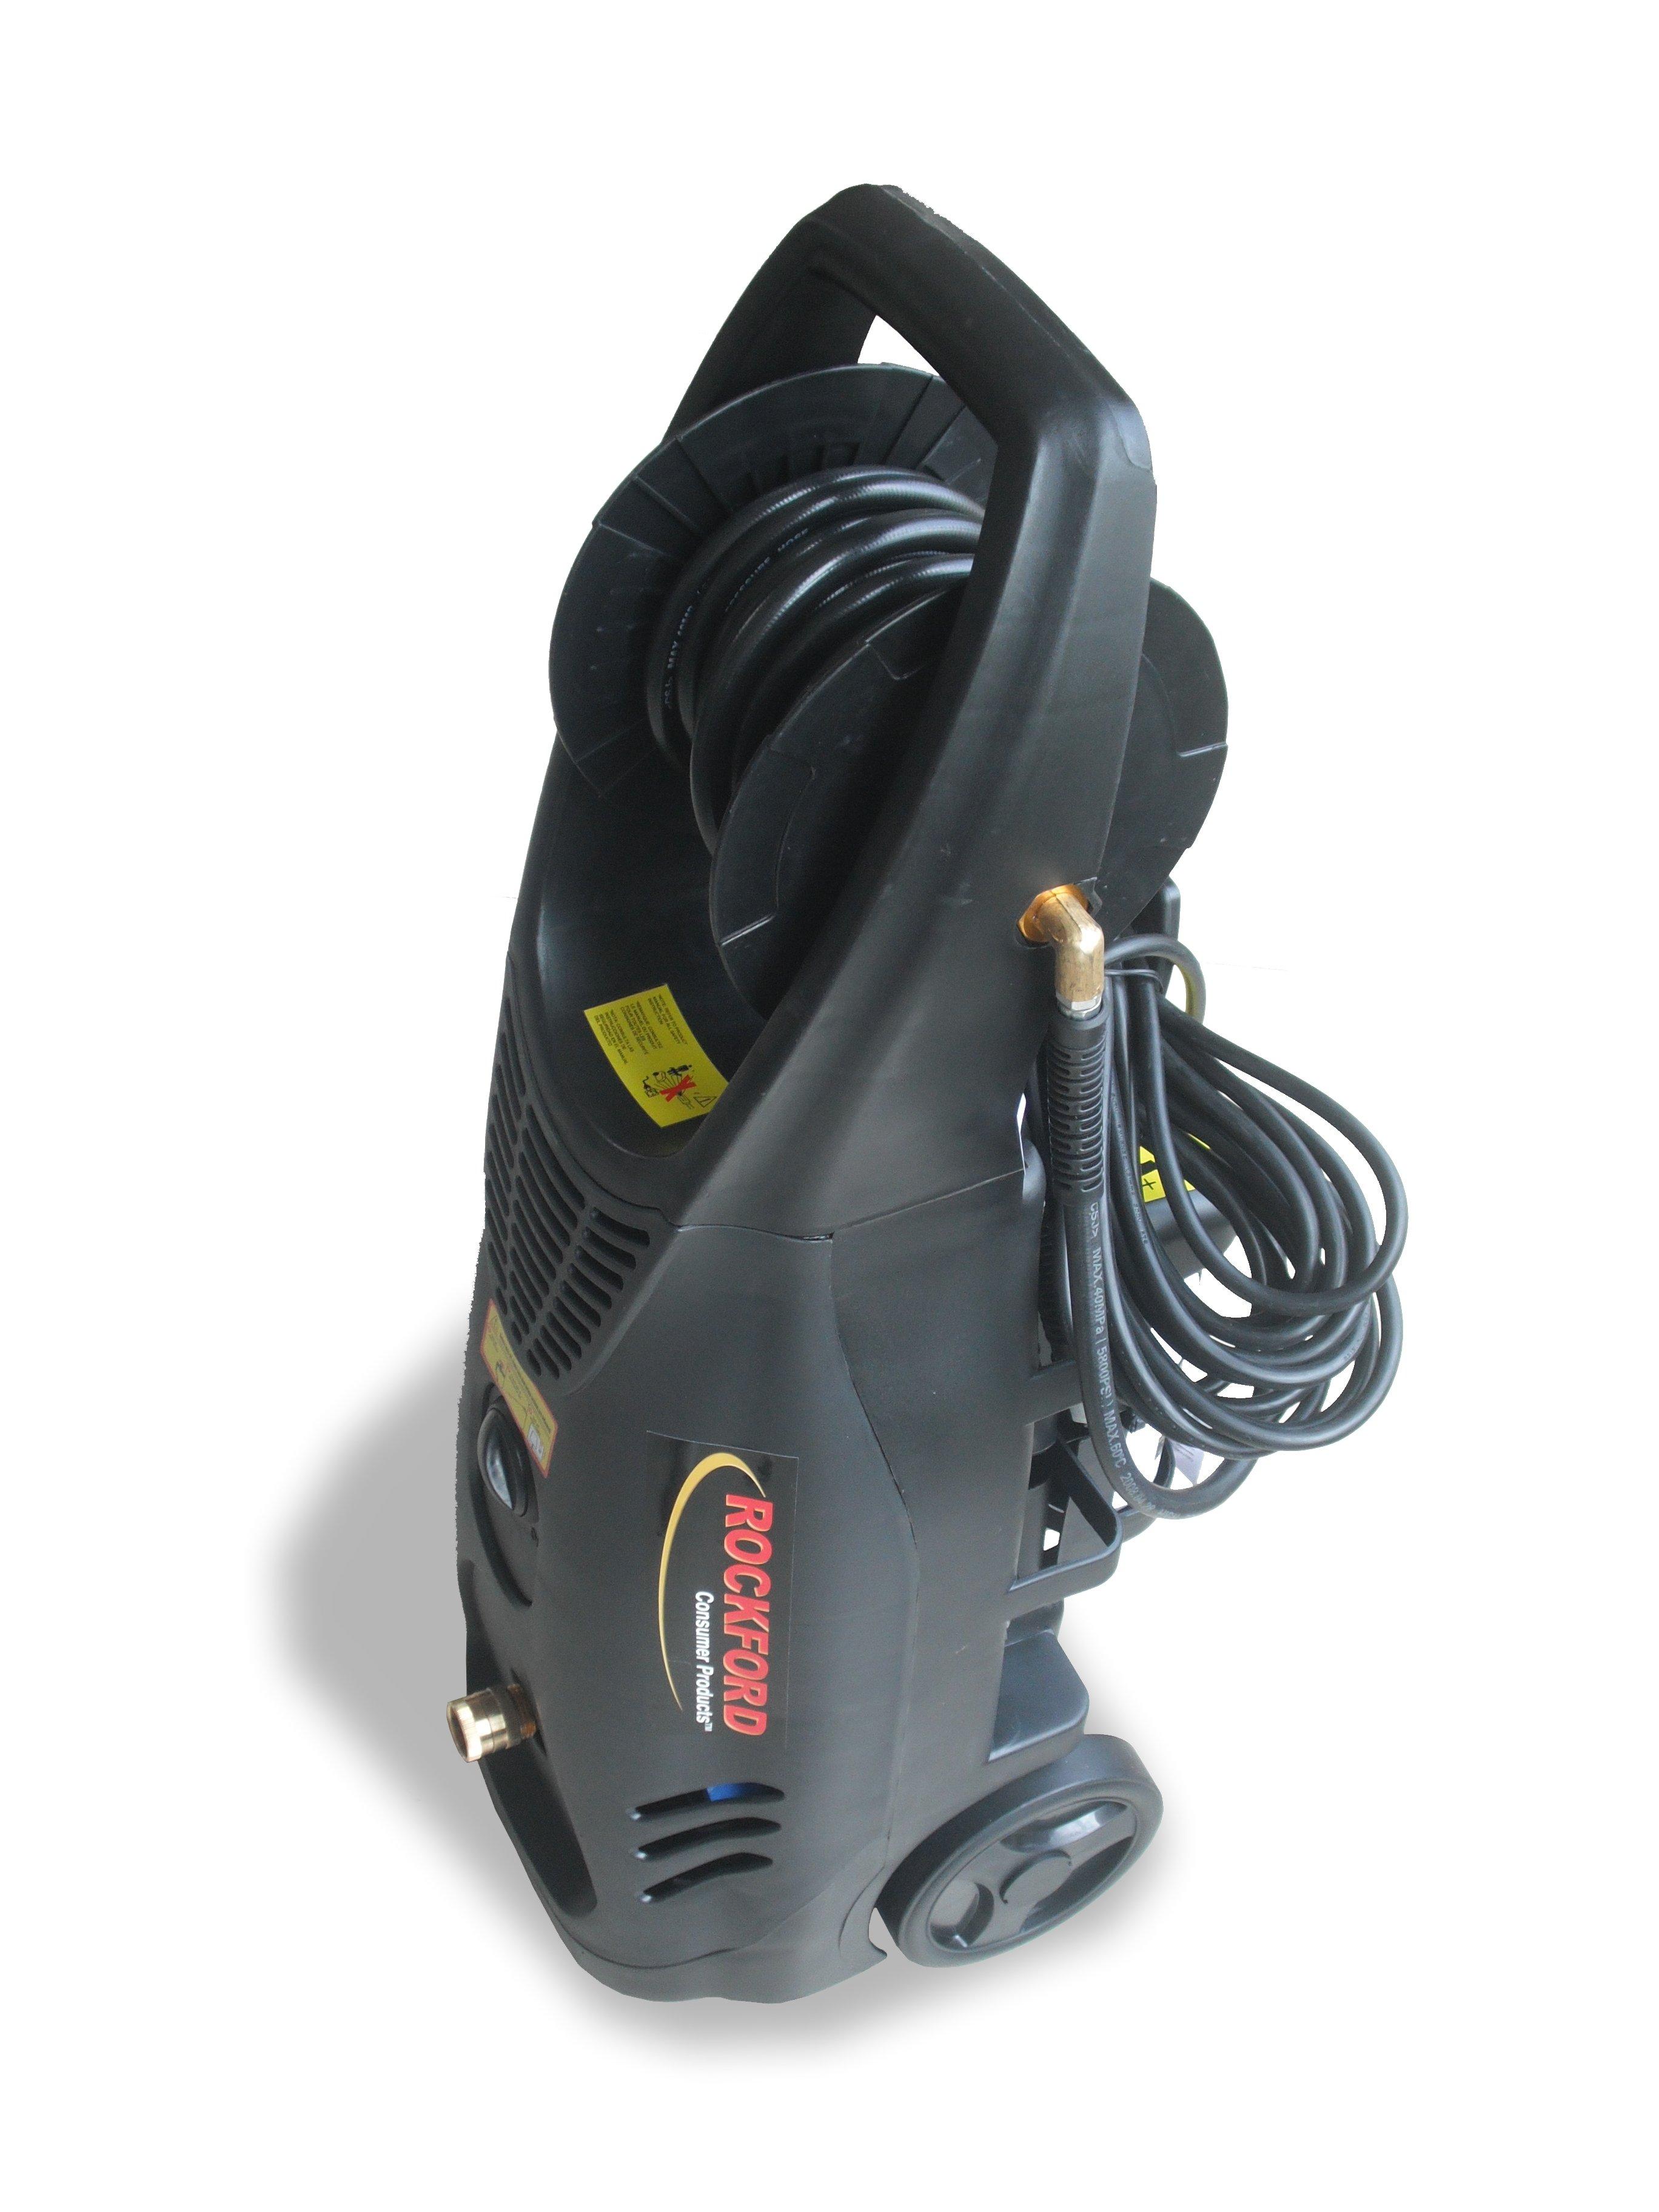 Amazon Com Rockford Cpu0207 2 000 Psi 1 6 Gpm Electric